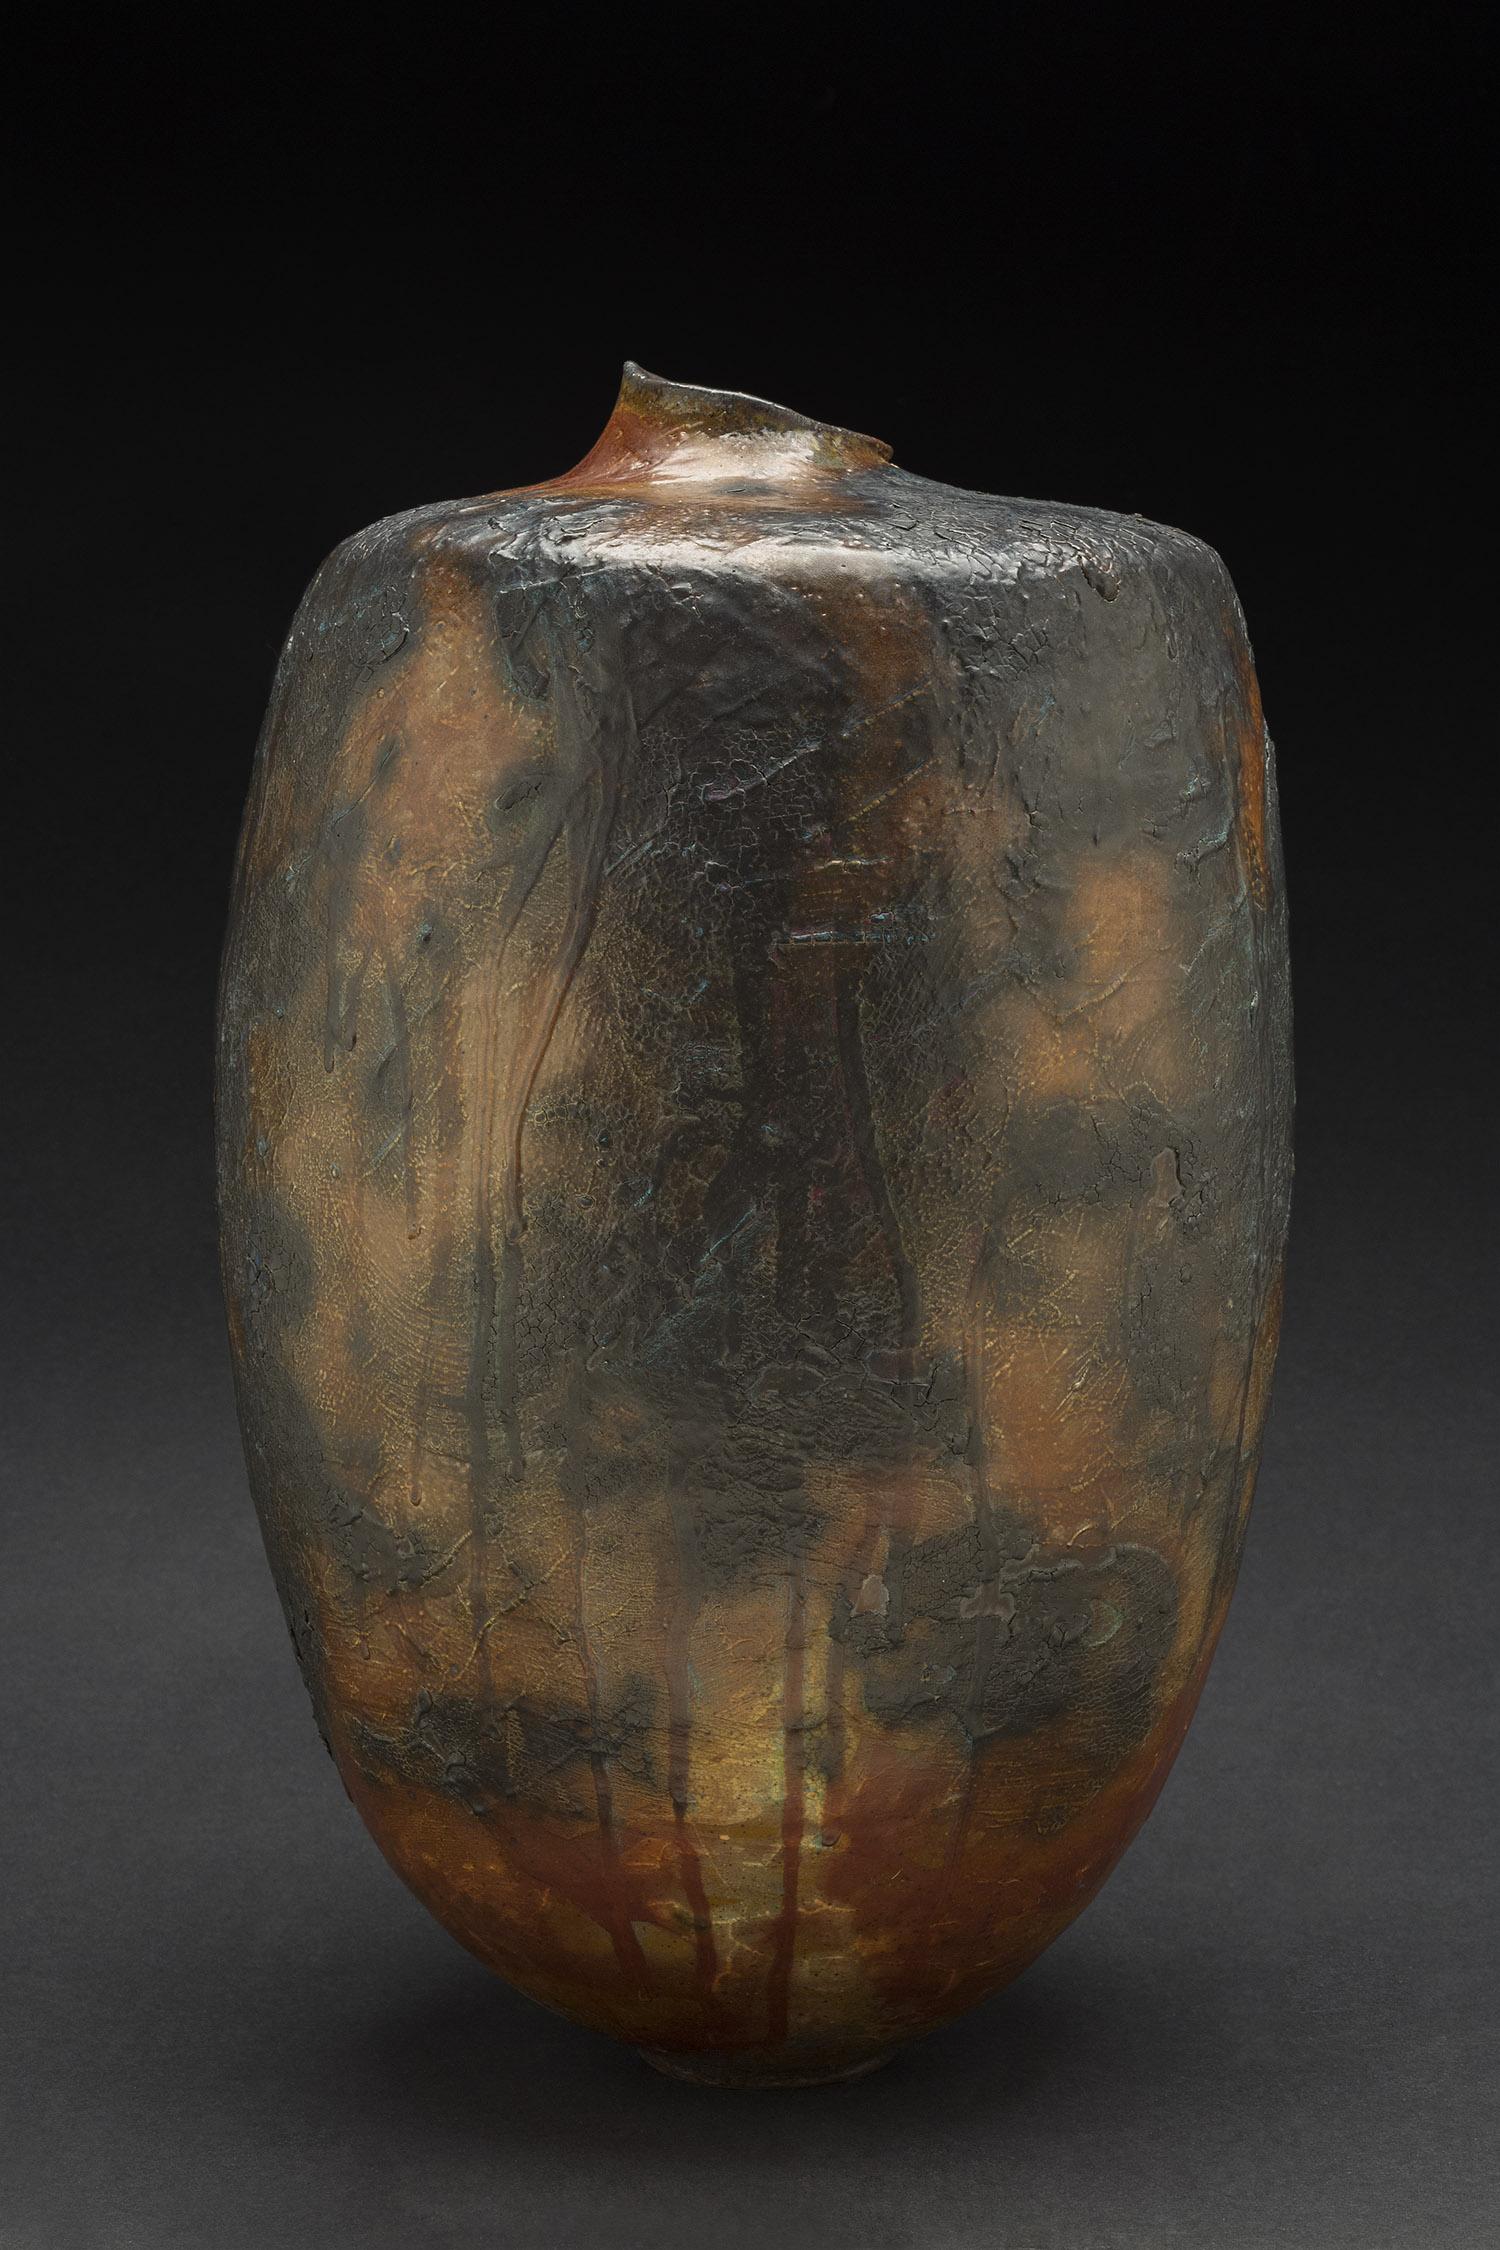 Melanie Ferguson    Clouds on Fire  , 2014 Handbuilt stoneware, kohiki slip, copper black oxide stain, flashing slip. Soda fired to cone 11. 15 x 9 x 9 inches 38.1 x 22.9 x 22.9 cm MFe 16